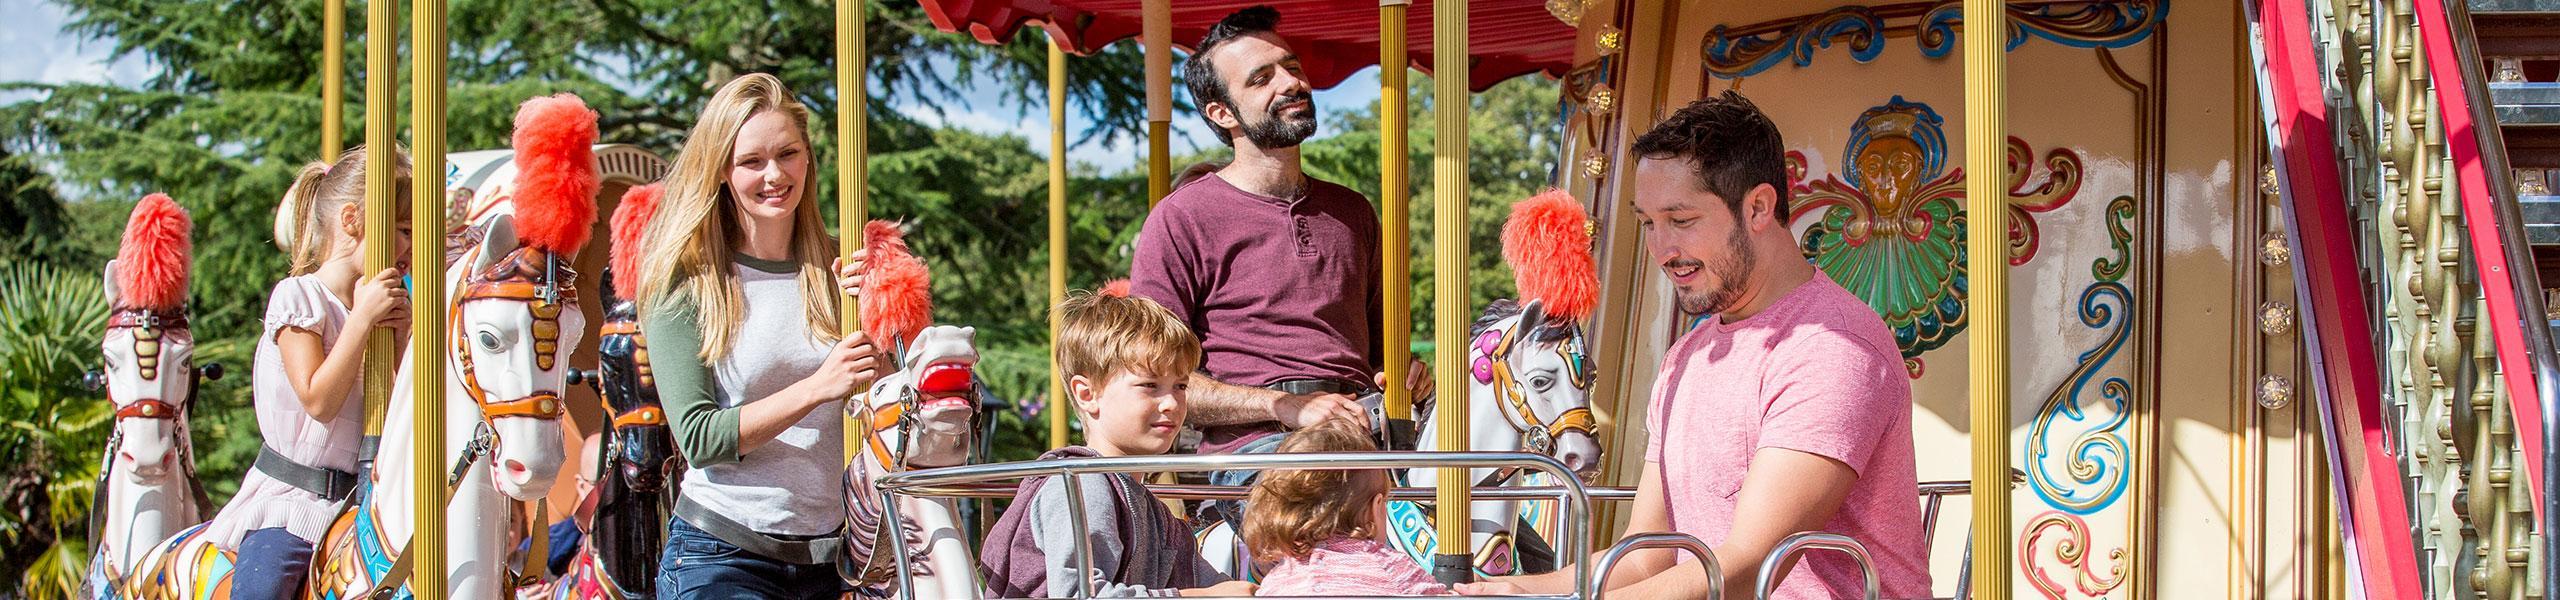 Victorian Horse Carousel Ride